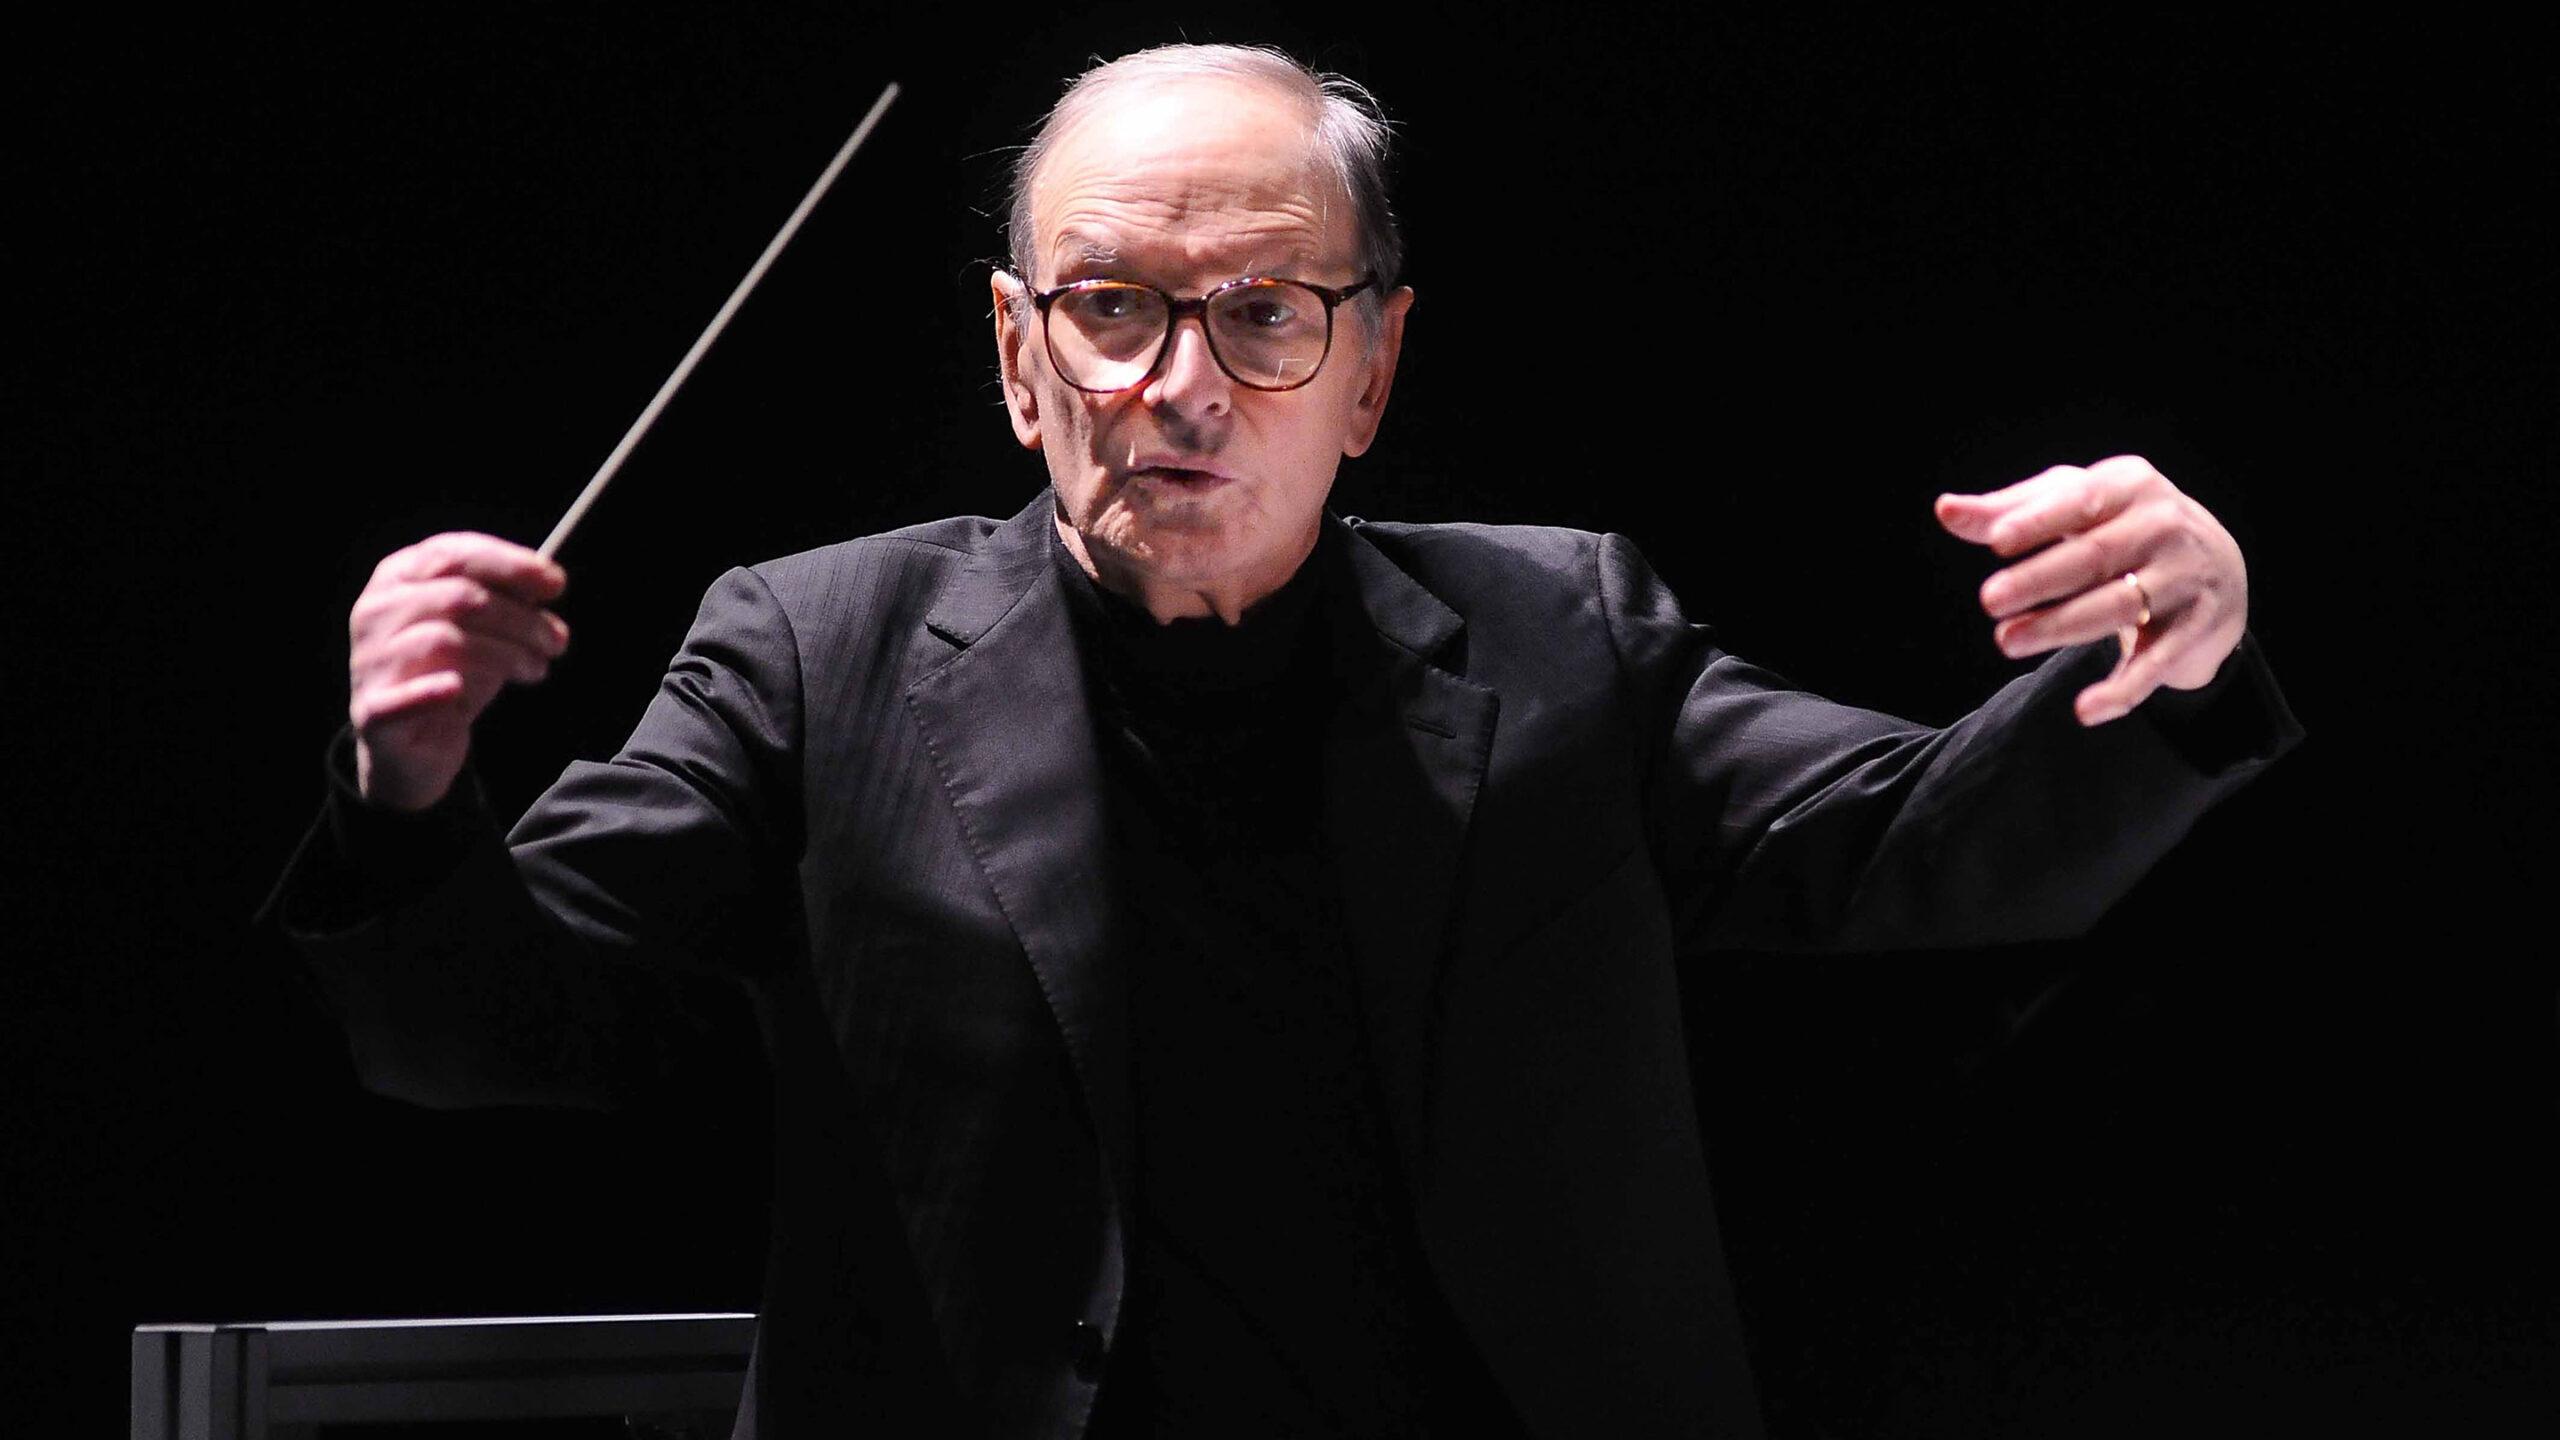 Ennio Morricone, Oscar-winning composer Died at 91